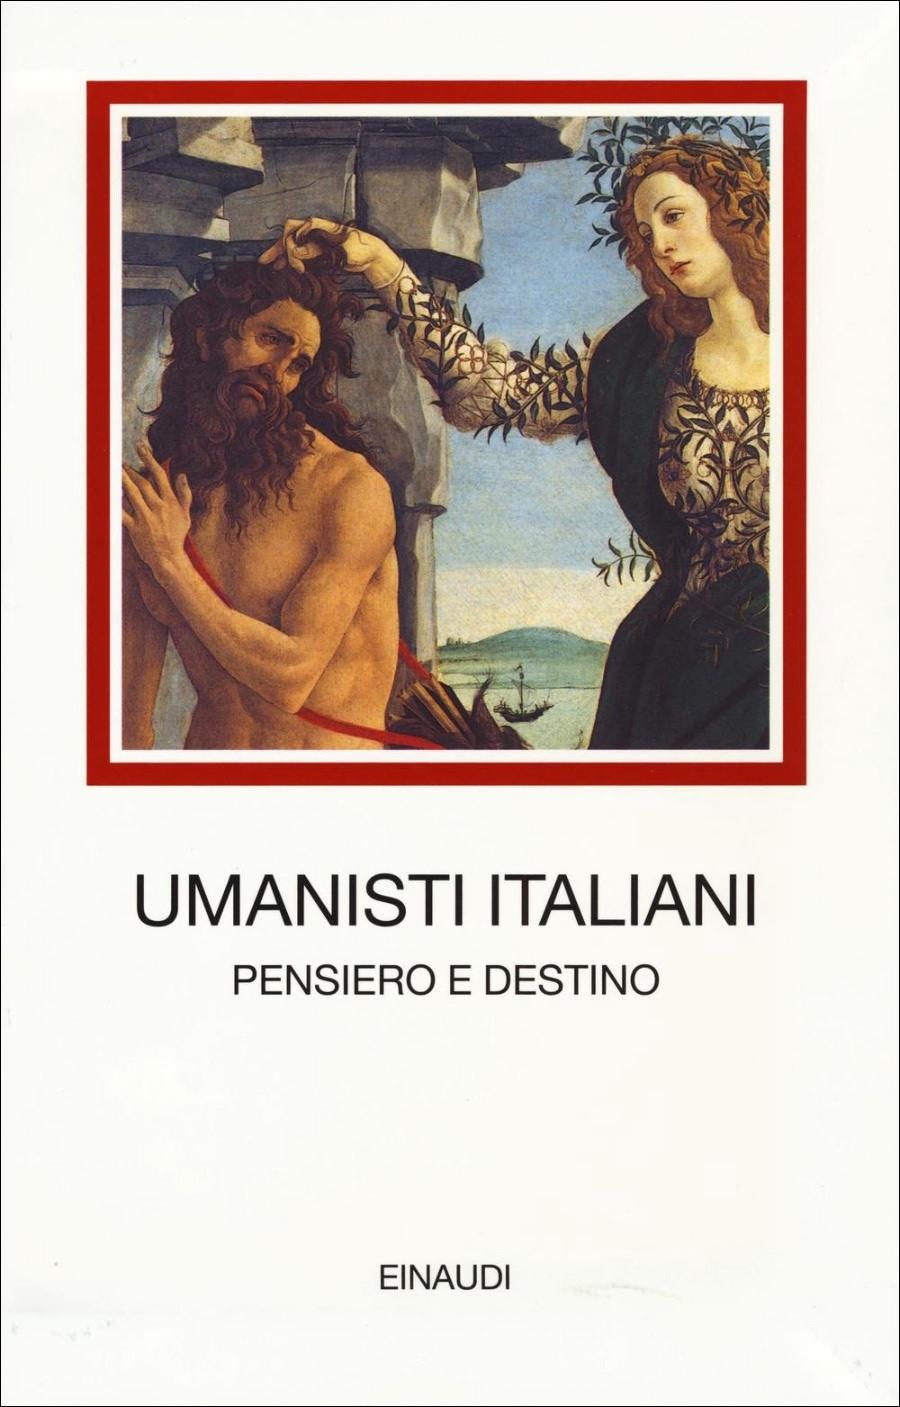 Umanisti italiani Pensiero e destino